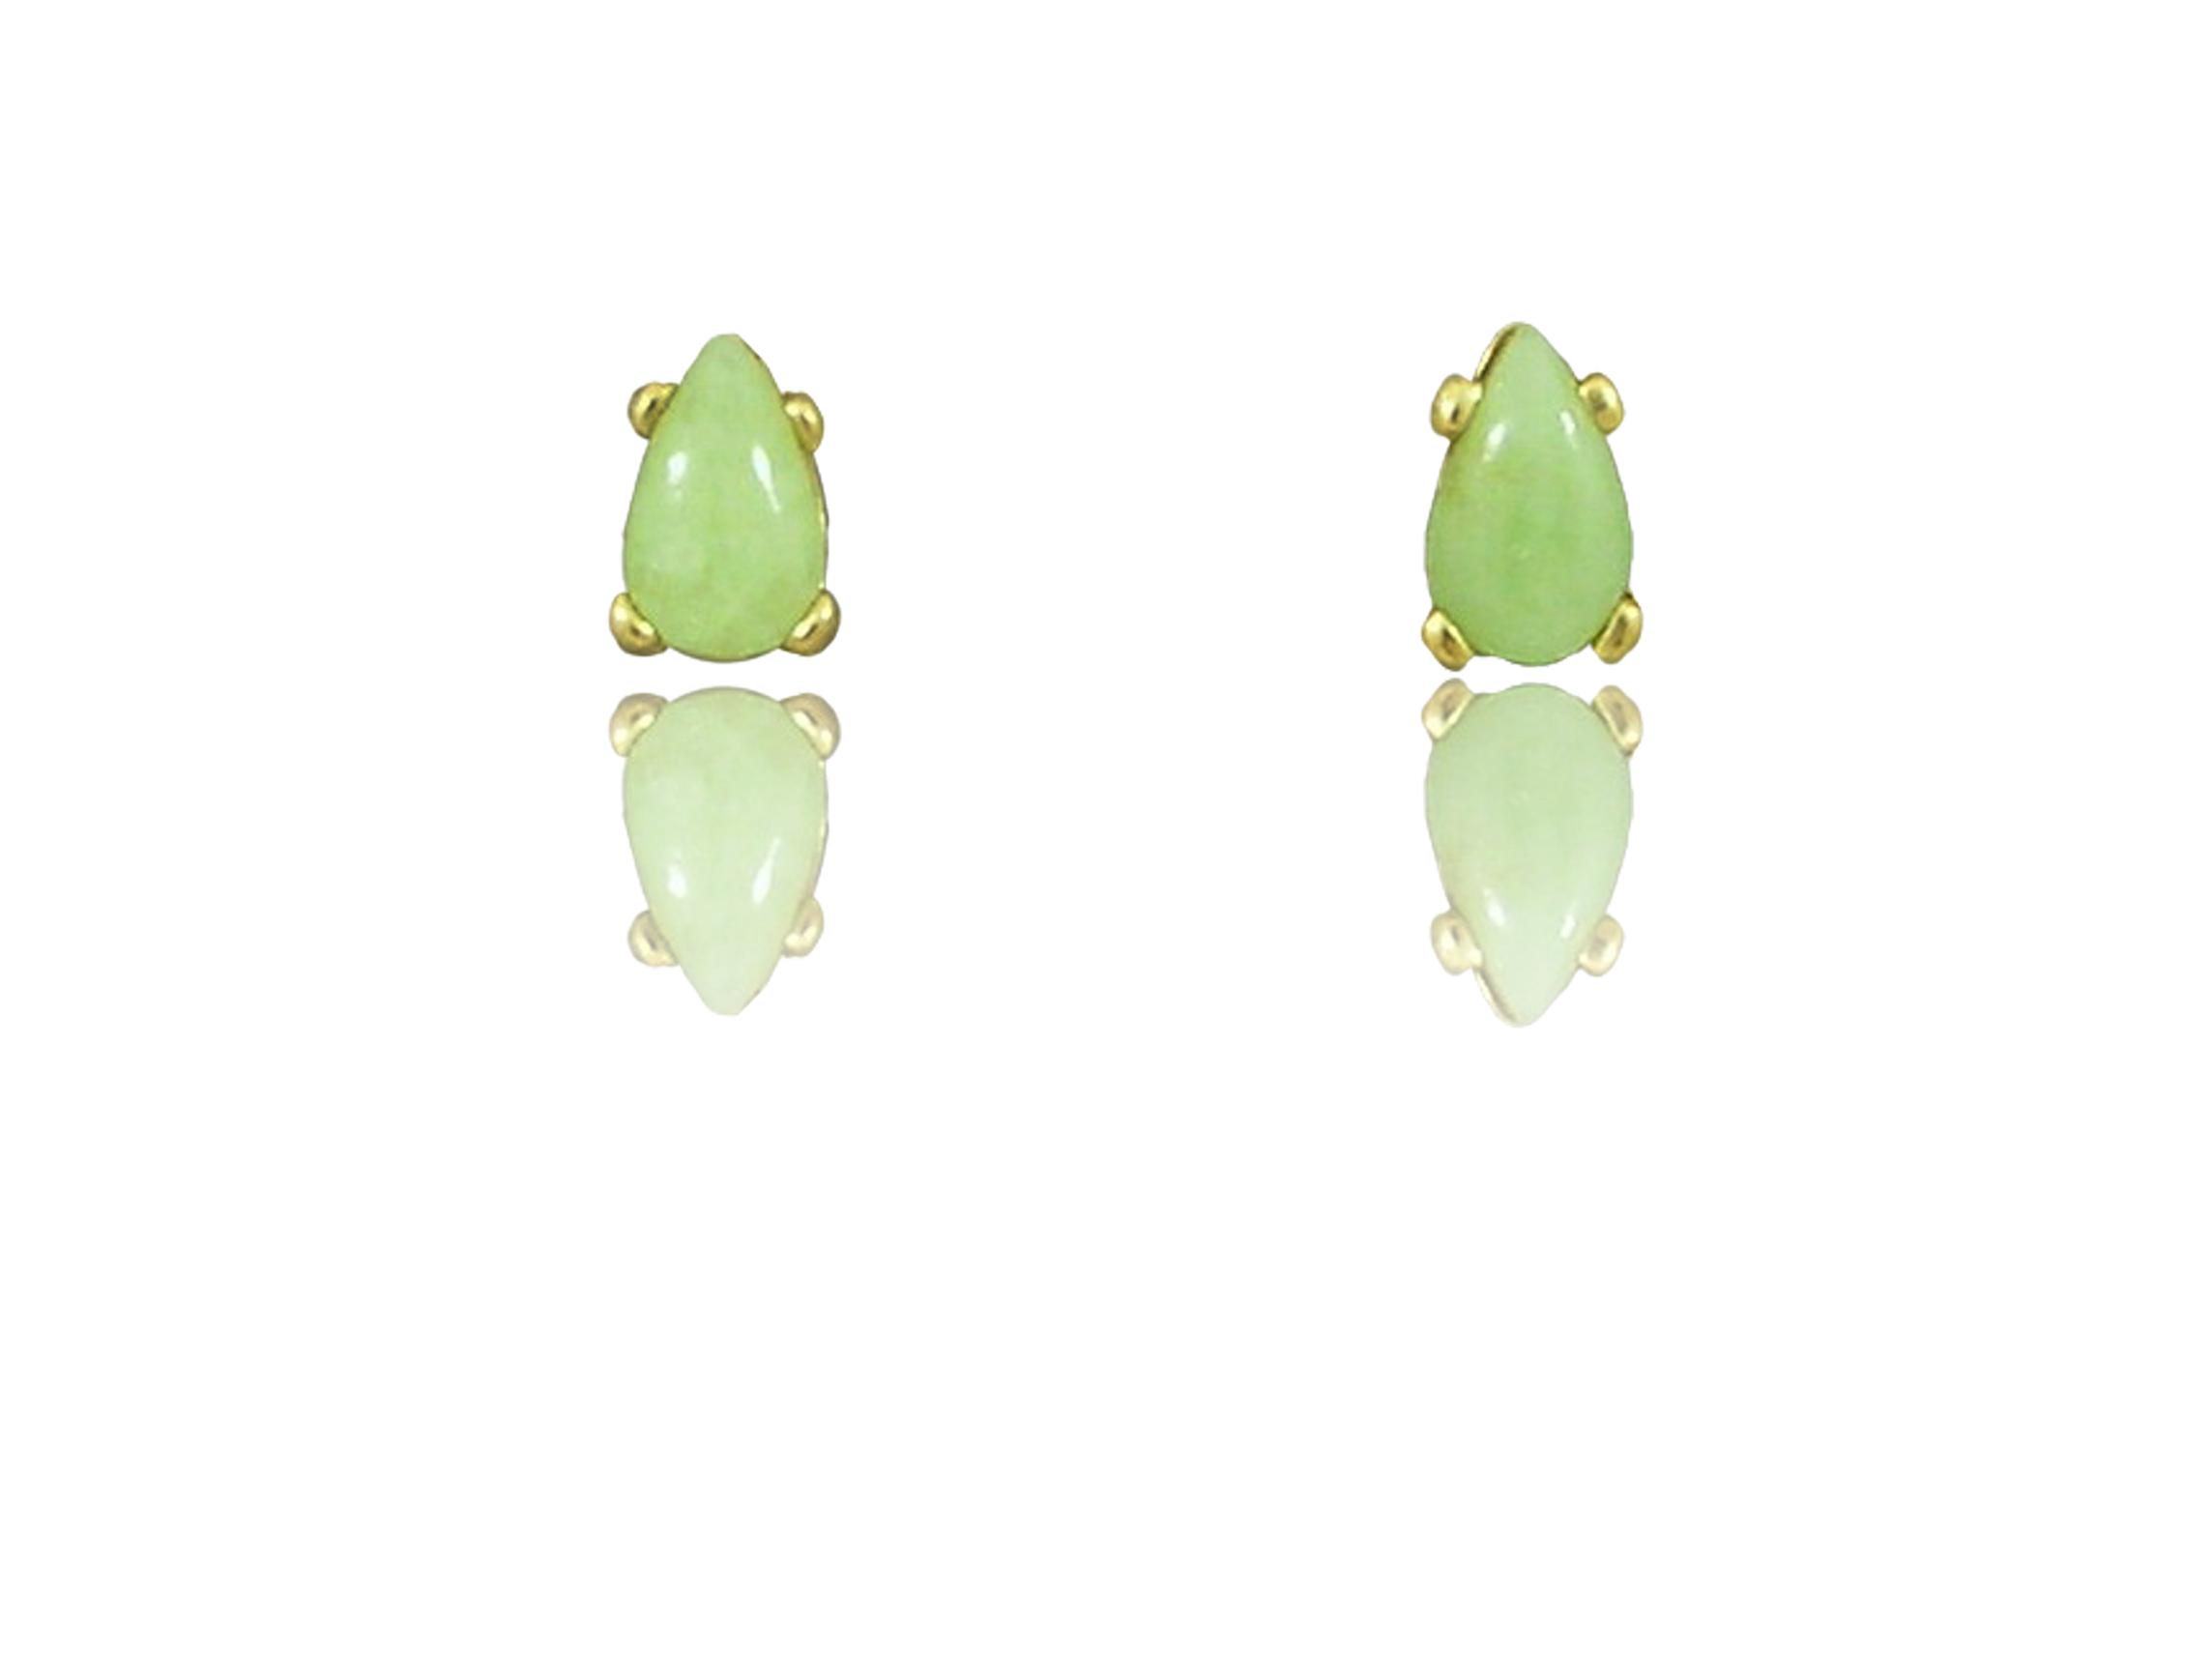 14k Gold Teardrop Shaped Idocrase Aztec Jade Earrings Available In Three